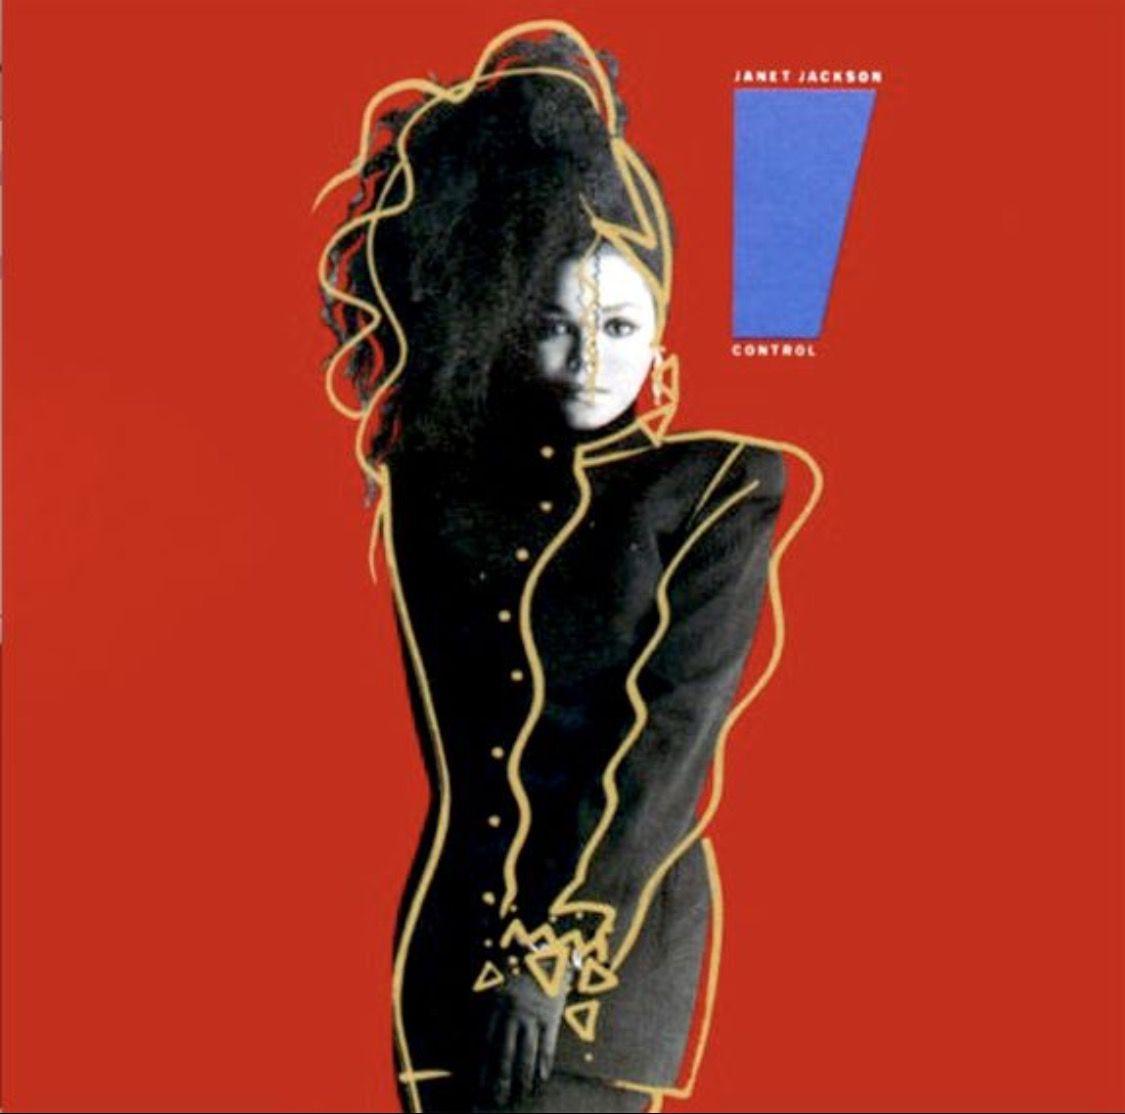 Pin by Melissa Acosta-Jensen on My Favorite Music | Janet ...